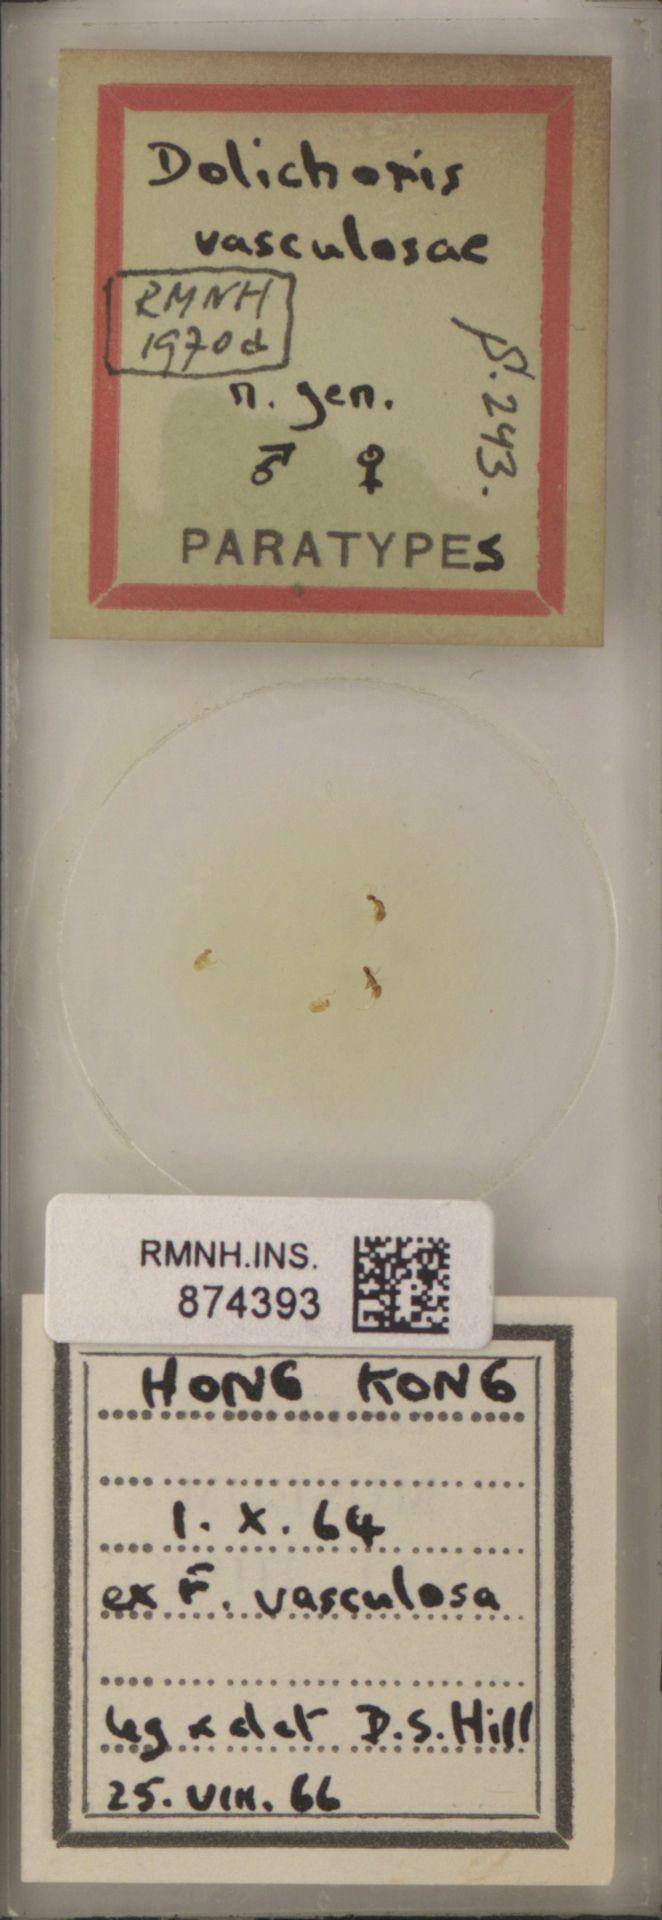 RMNH.INS.874393 | Dolichoris vasculosae